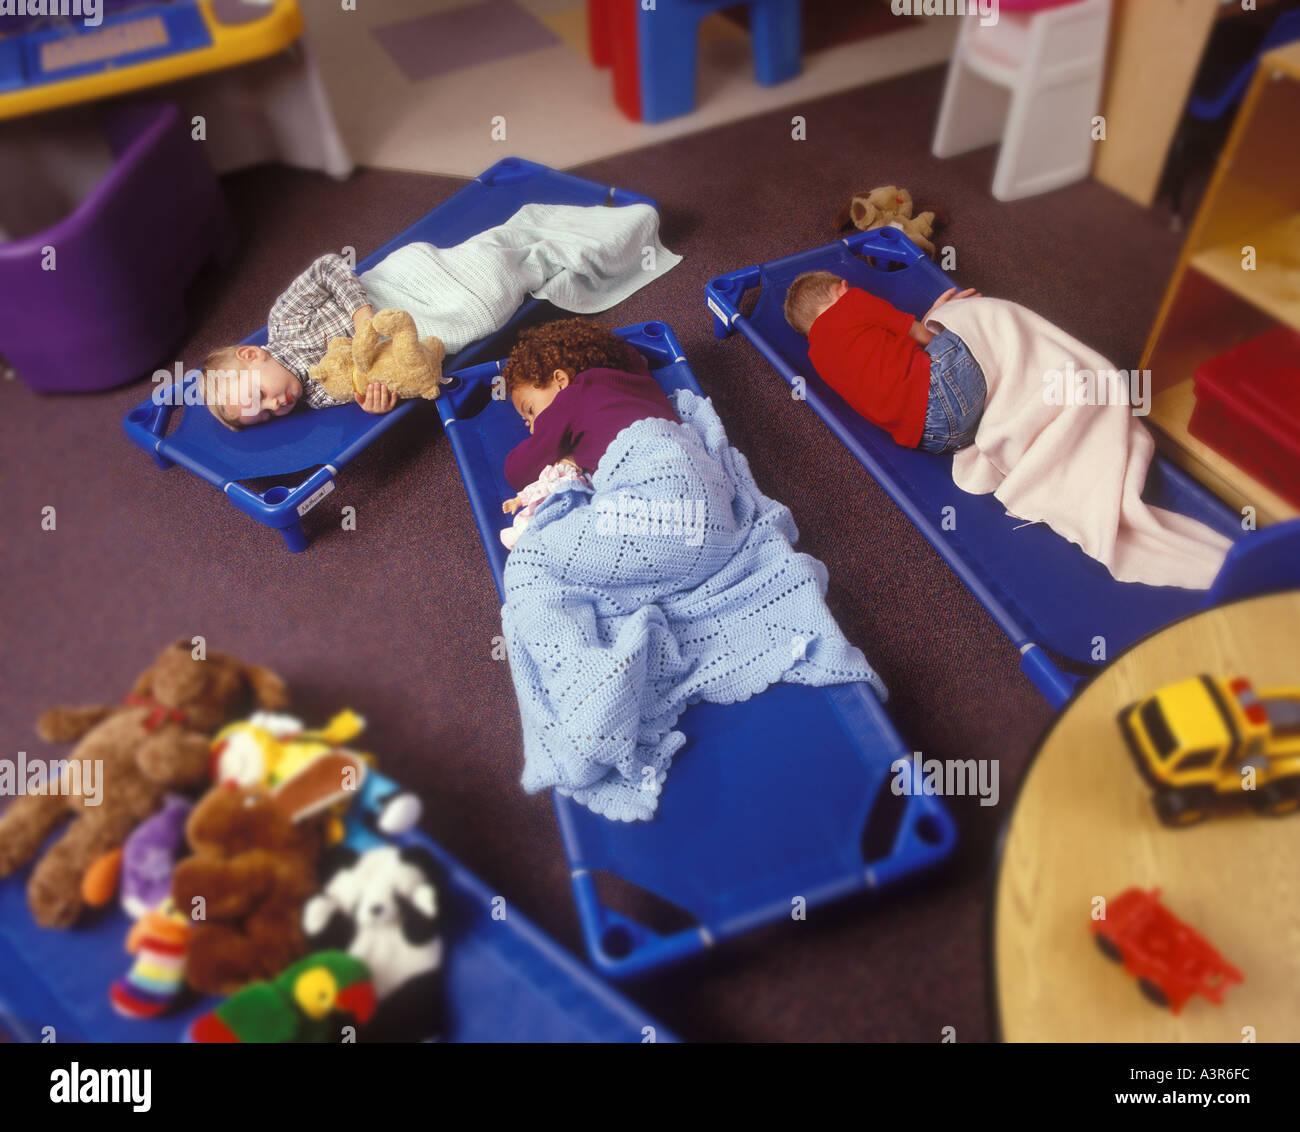 Floor mats to sleep on - Children Sleeping On Floor Mats At A Daycare Center